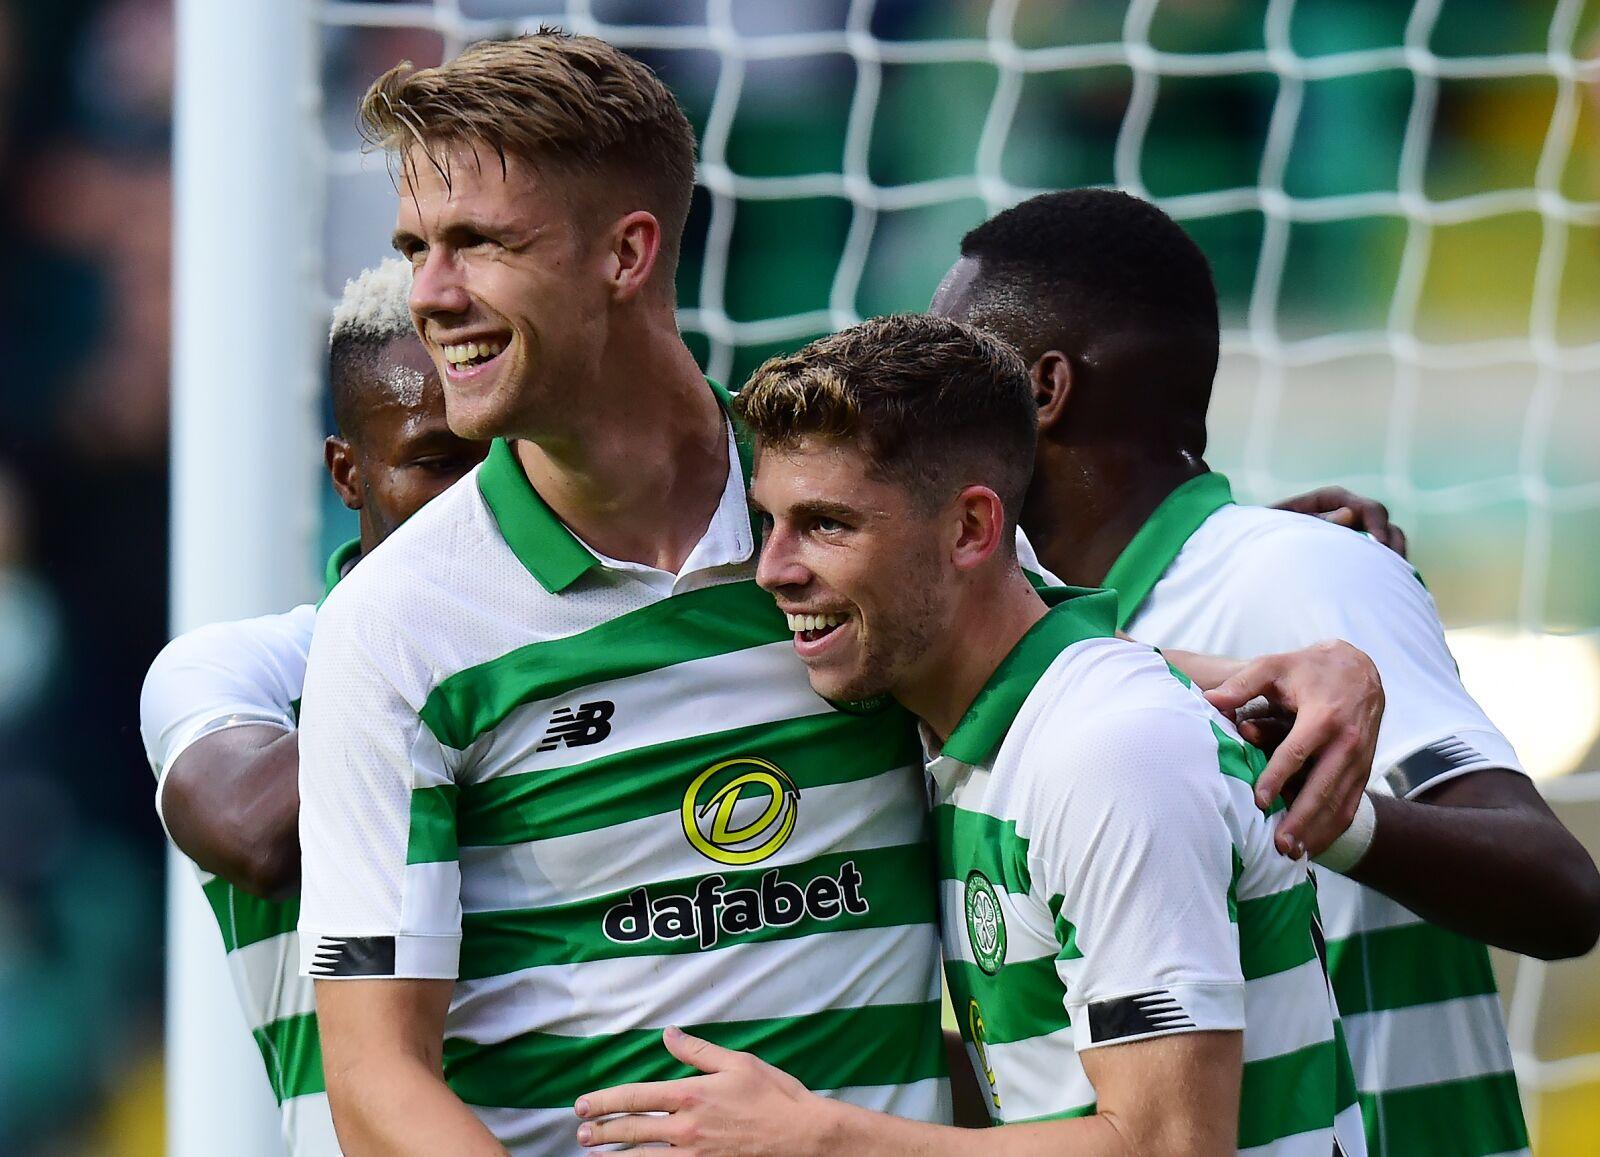 Celtic Predicted Starting XI vs St Johnstone: A big return?